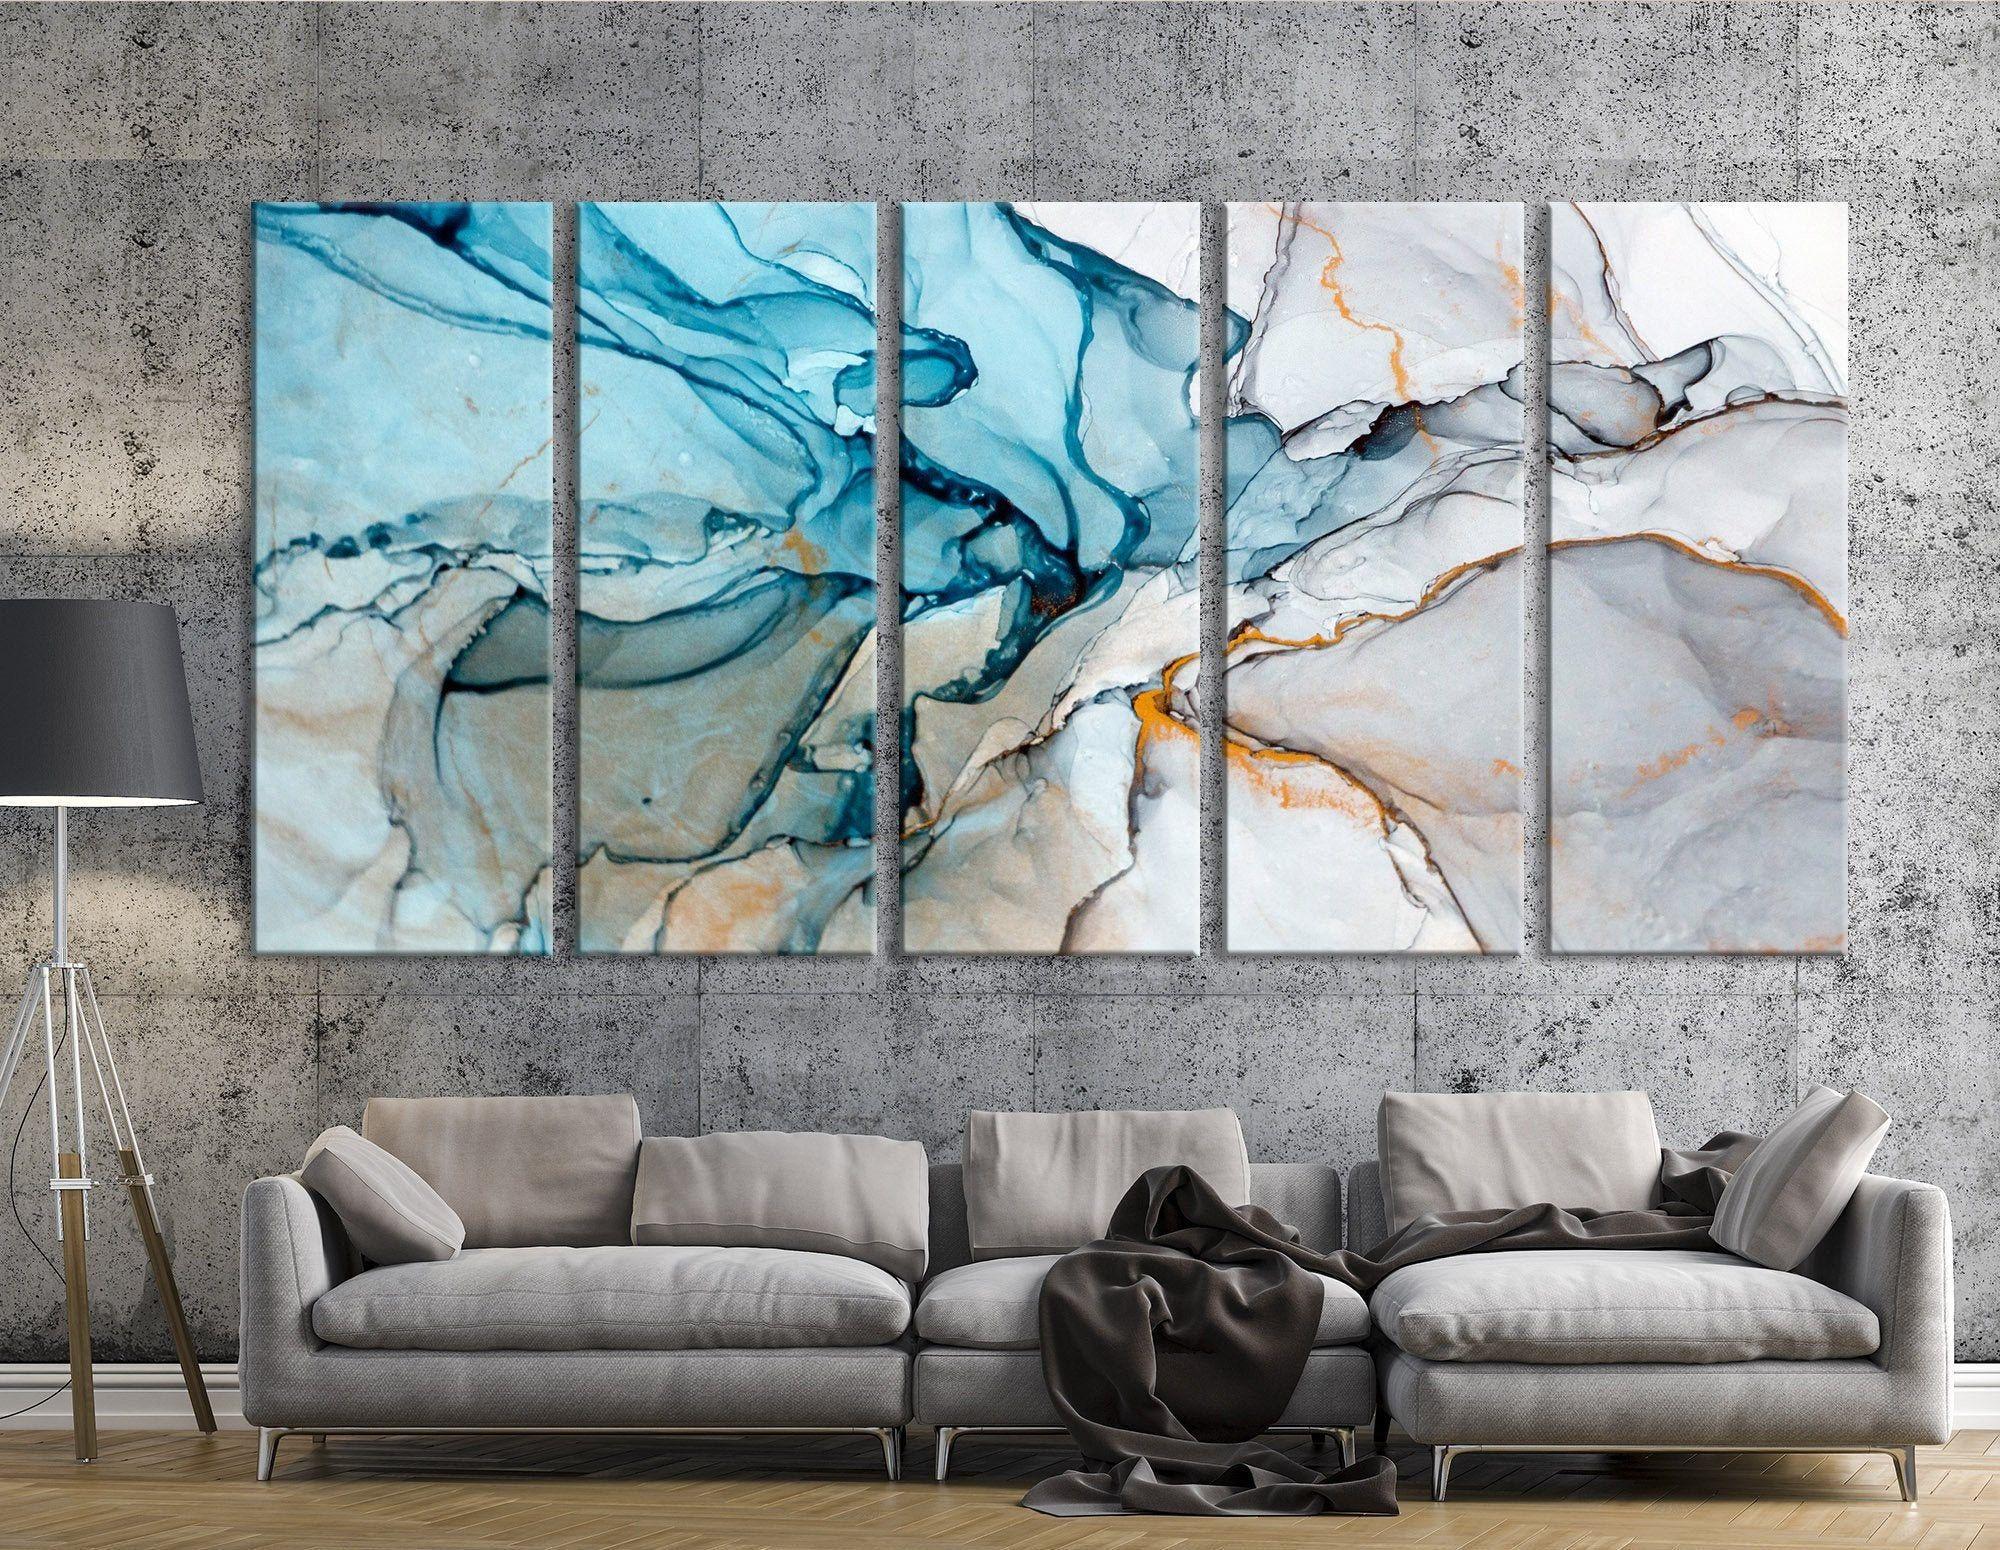 Arte De Marmol Grande Impresion De Lona De Marmol Arte Etsy In 2020 Large Canvas Art Marble Art Beautiful Abstract Art